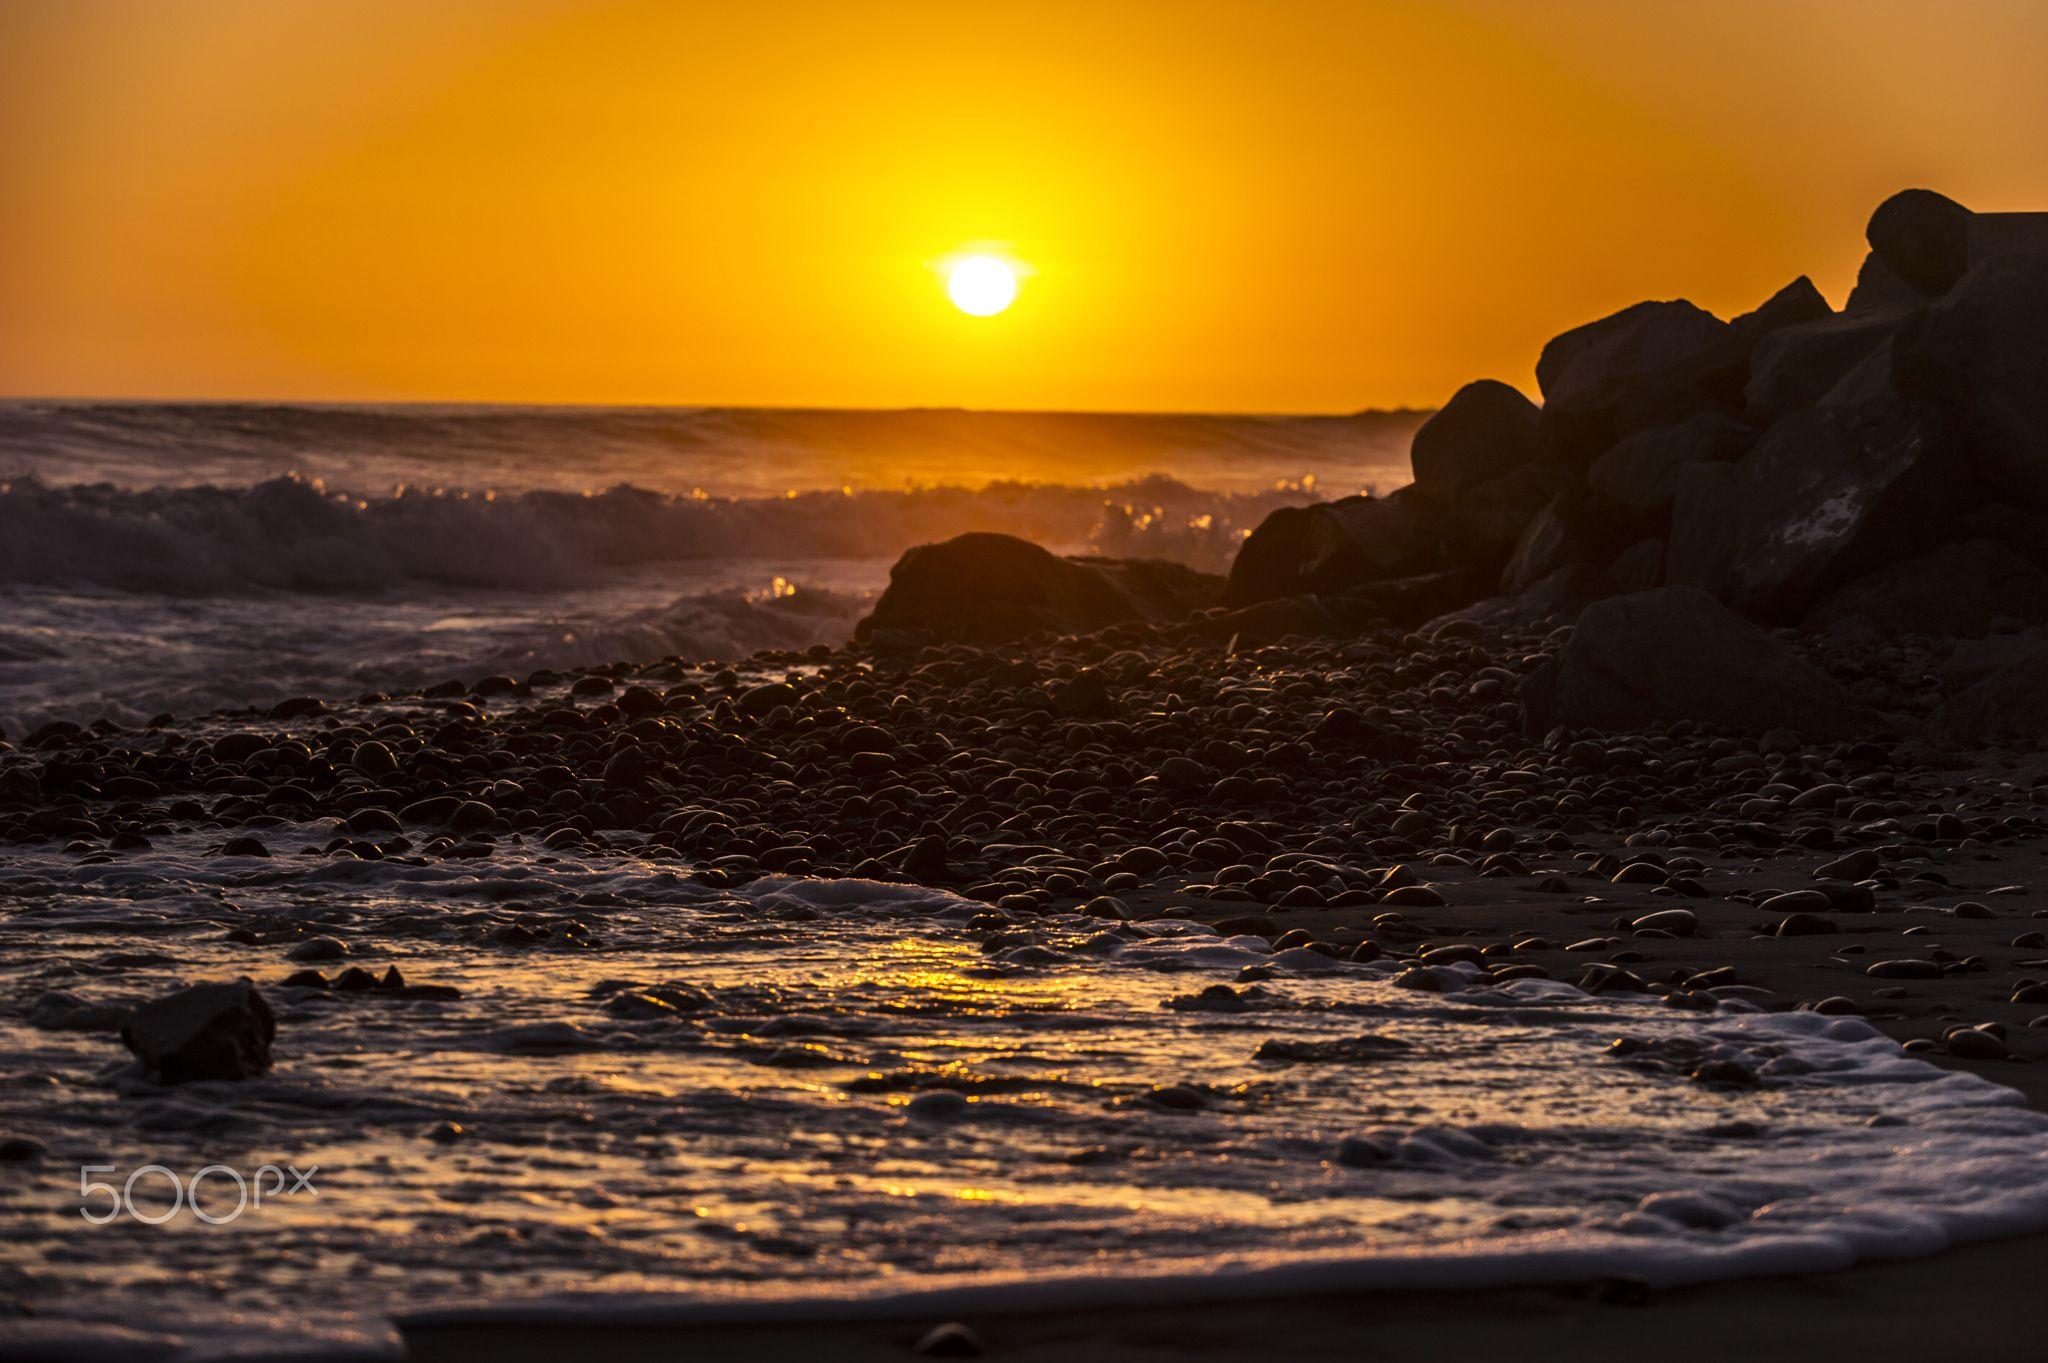 Golden Sunset in Oceanside - April 1, 2016. - Oceanside        April 1, 2016           ©2016 Rich Cruse \ CrusePhoto.com